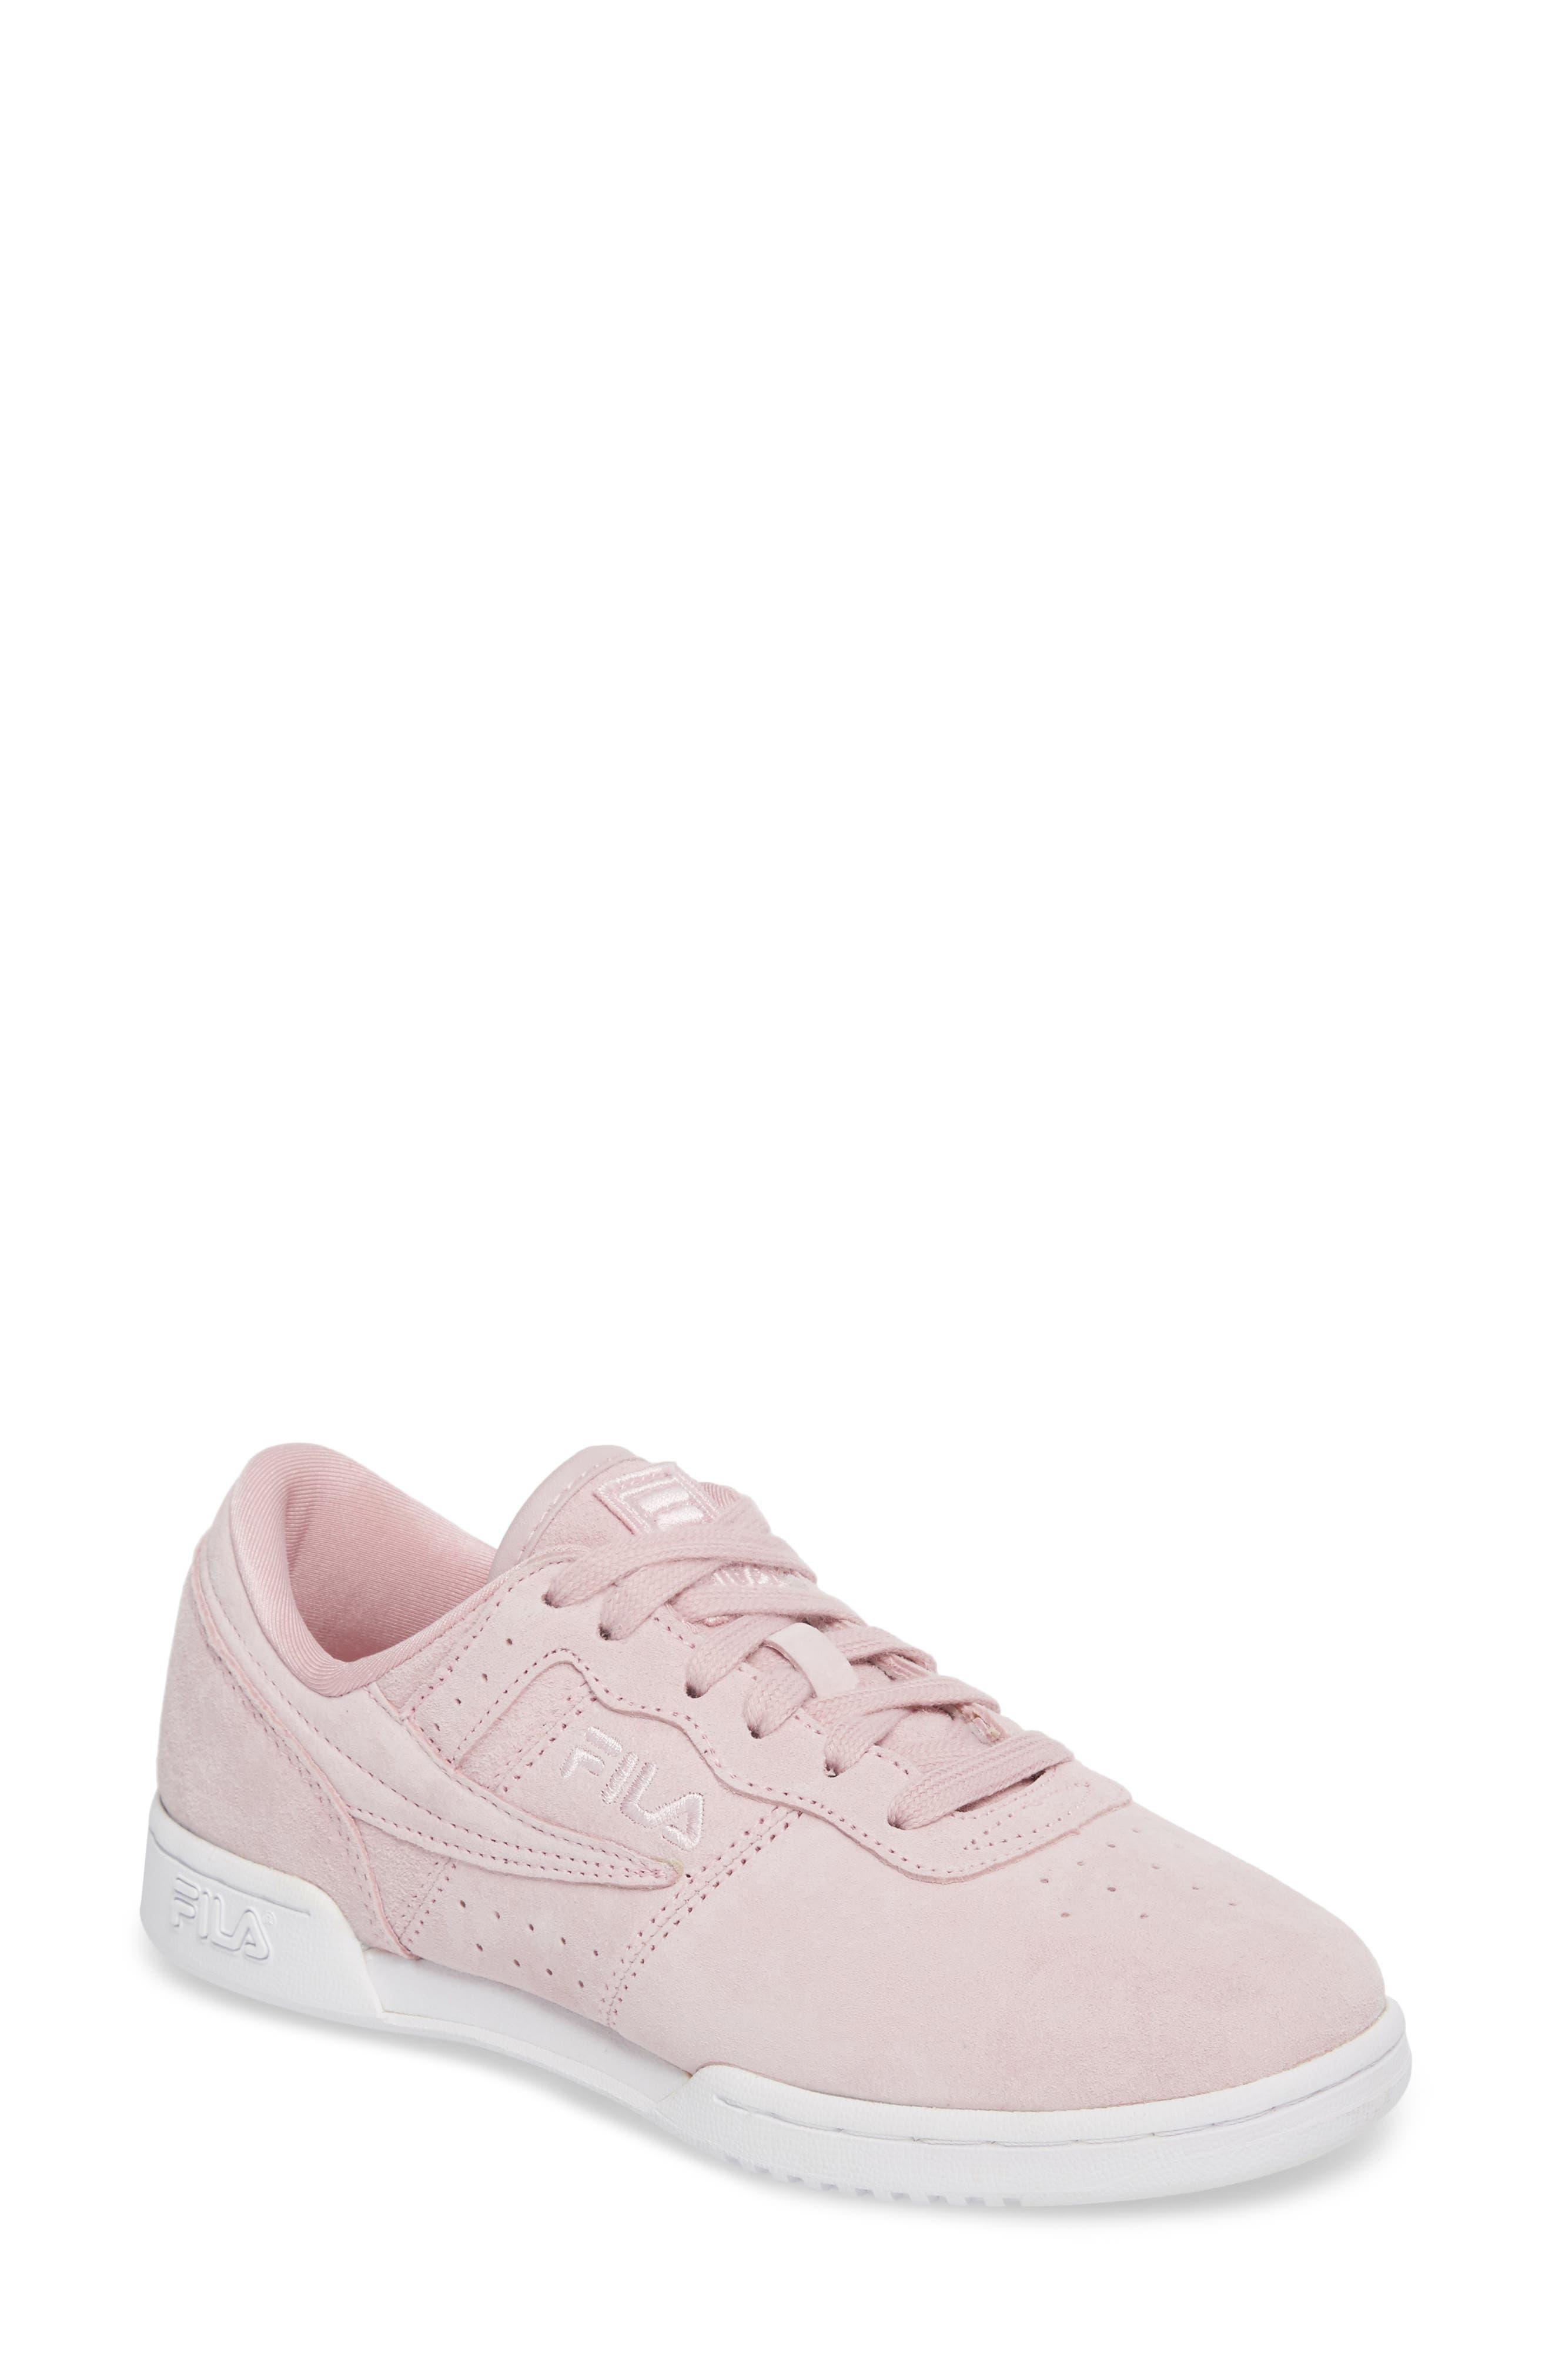 Original Fitness Premium Sneaker, Blush